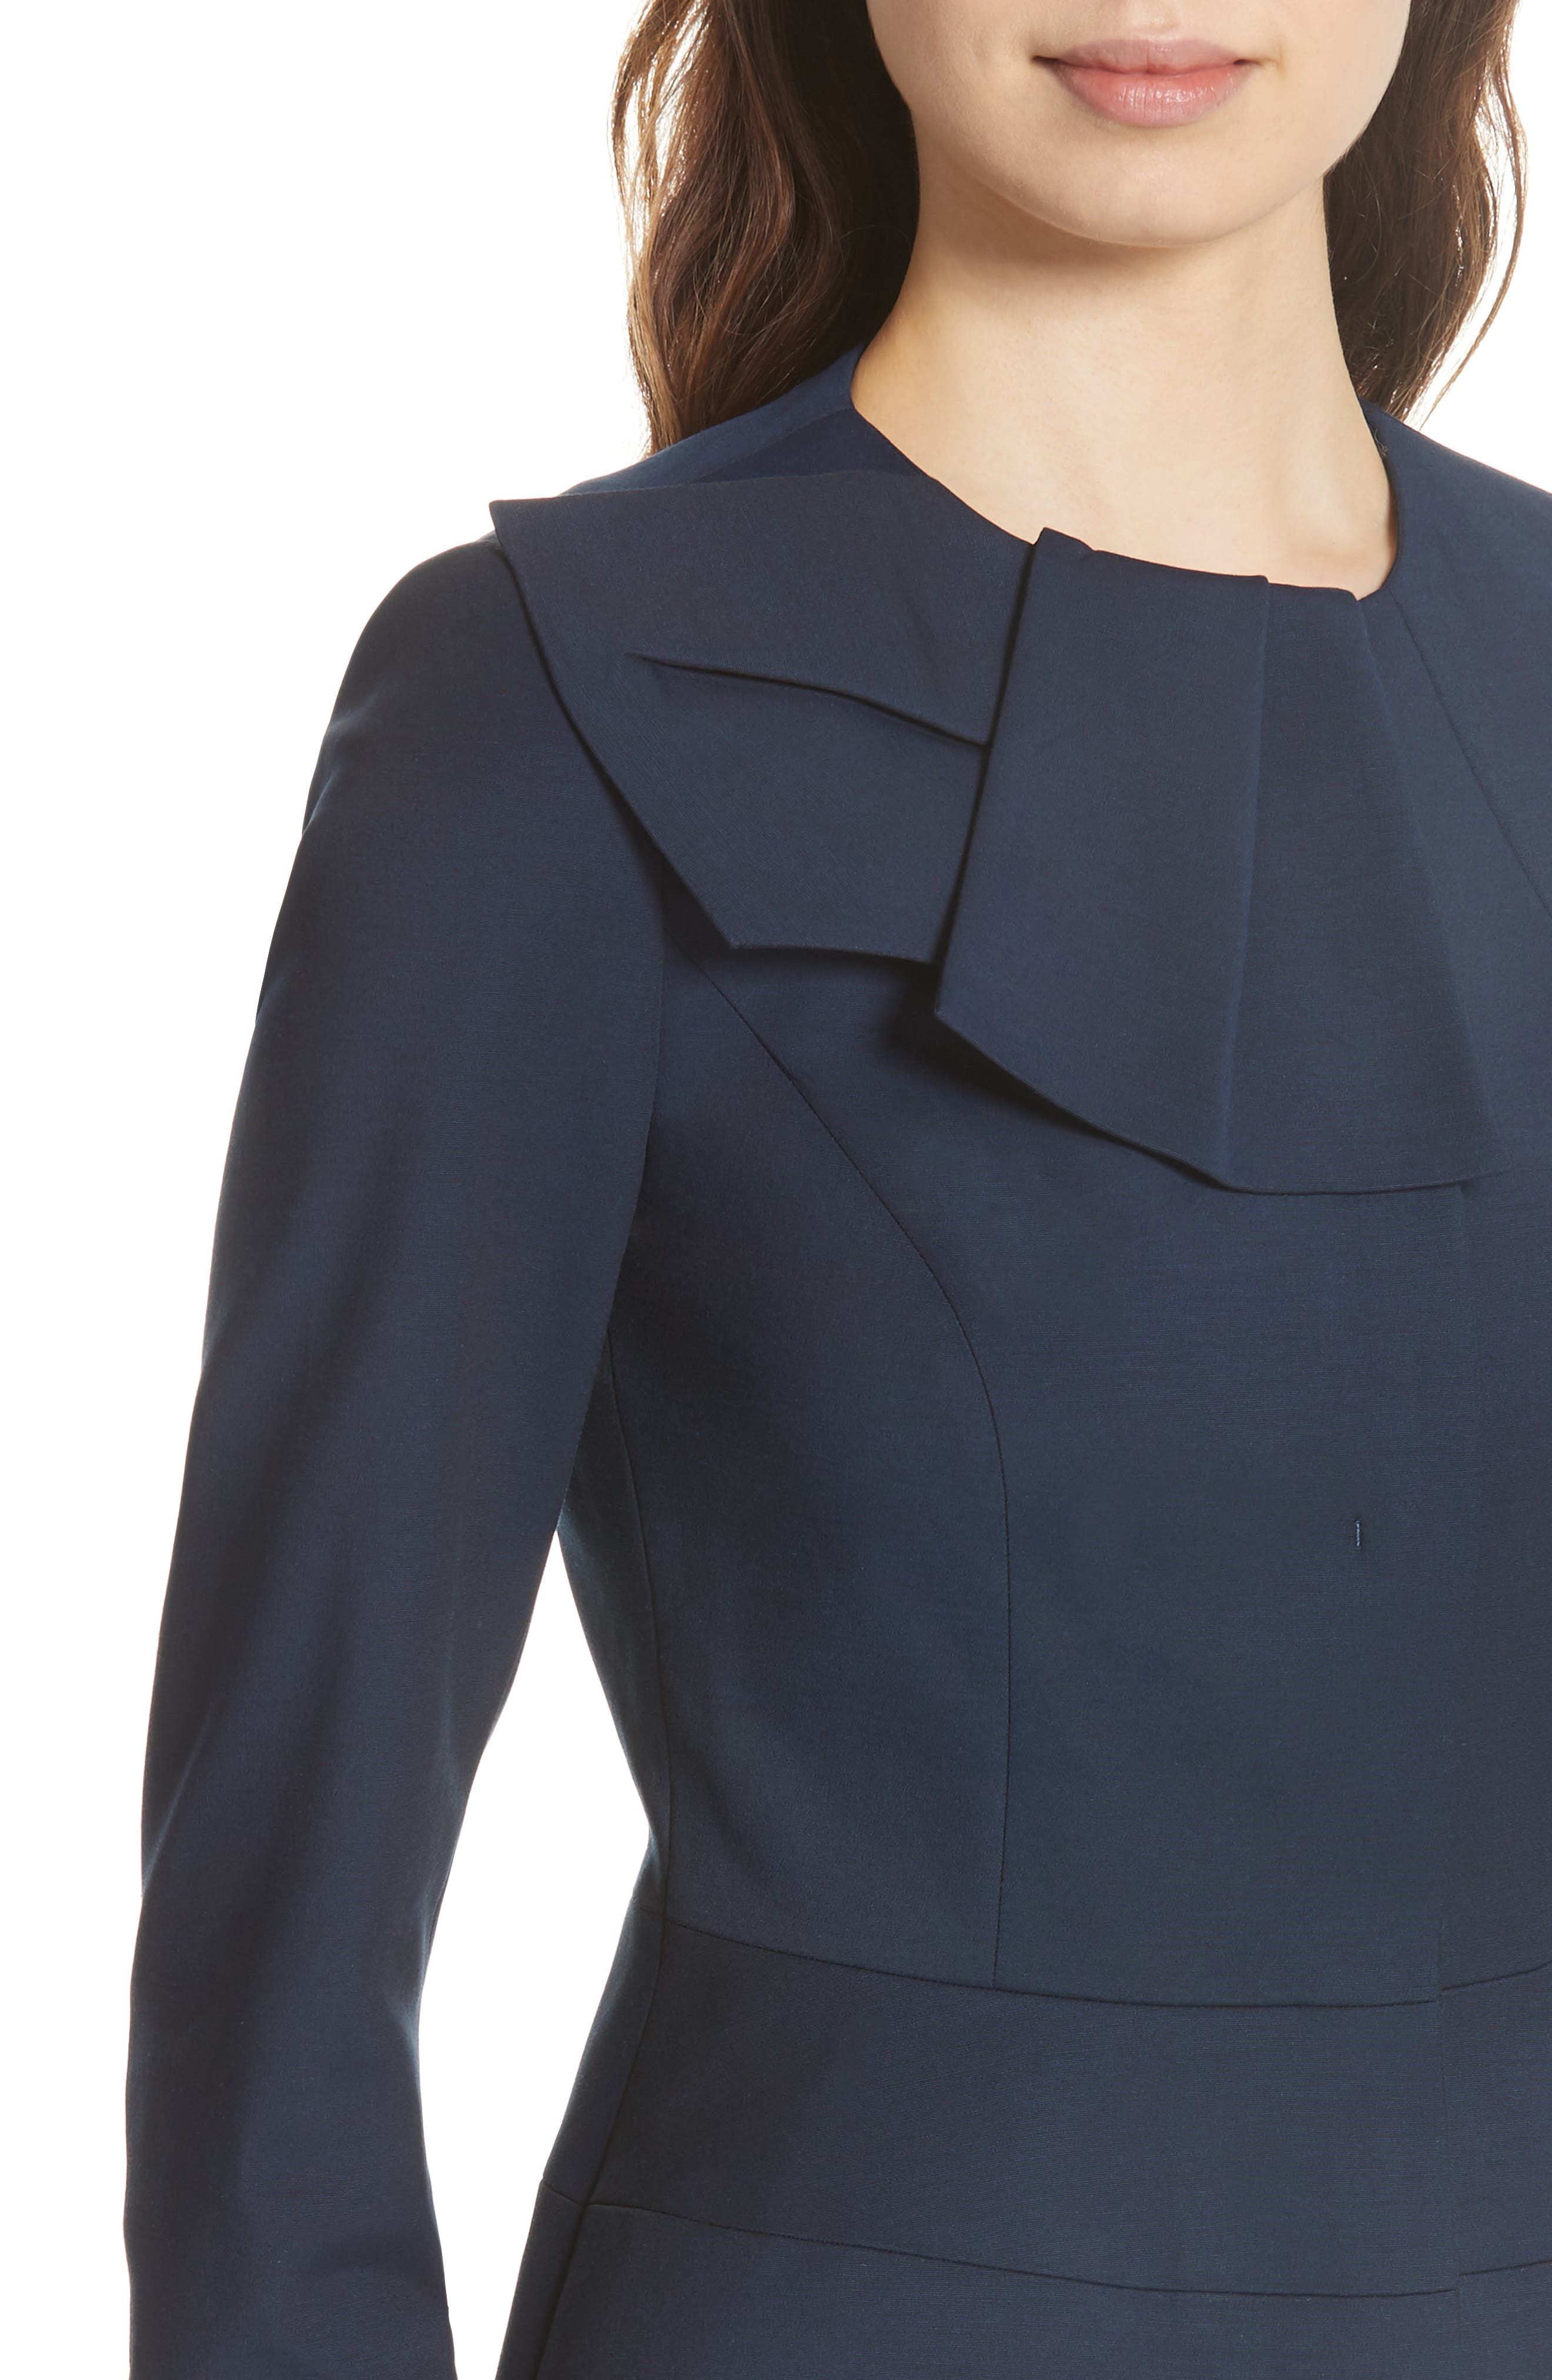 Rayal Bow Neck Peplum Jacket,                             Alternate thumbnail 4, color,                             Dark Blue